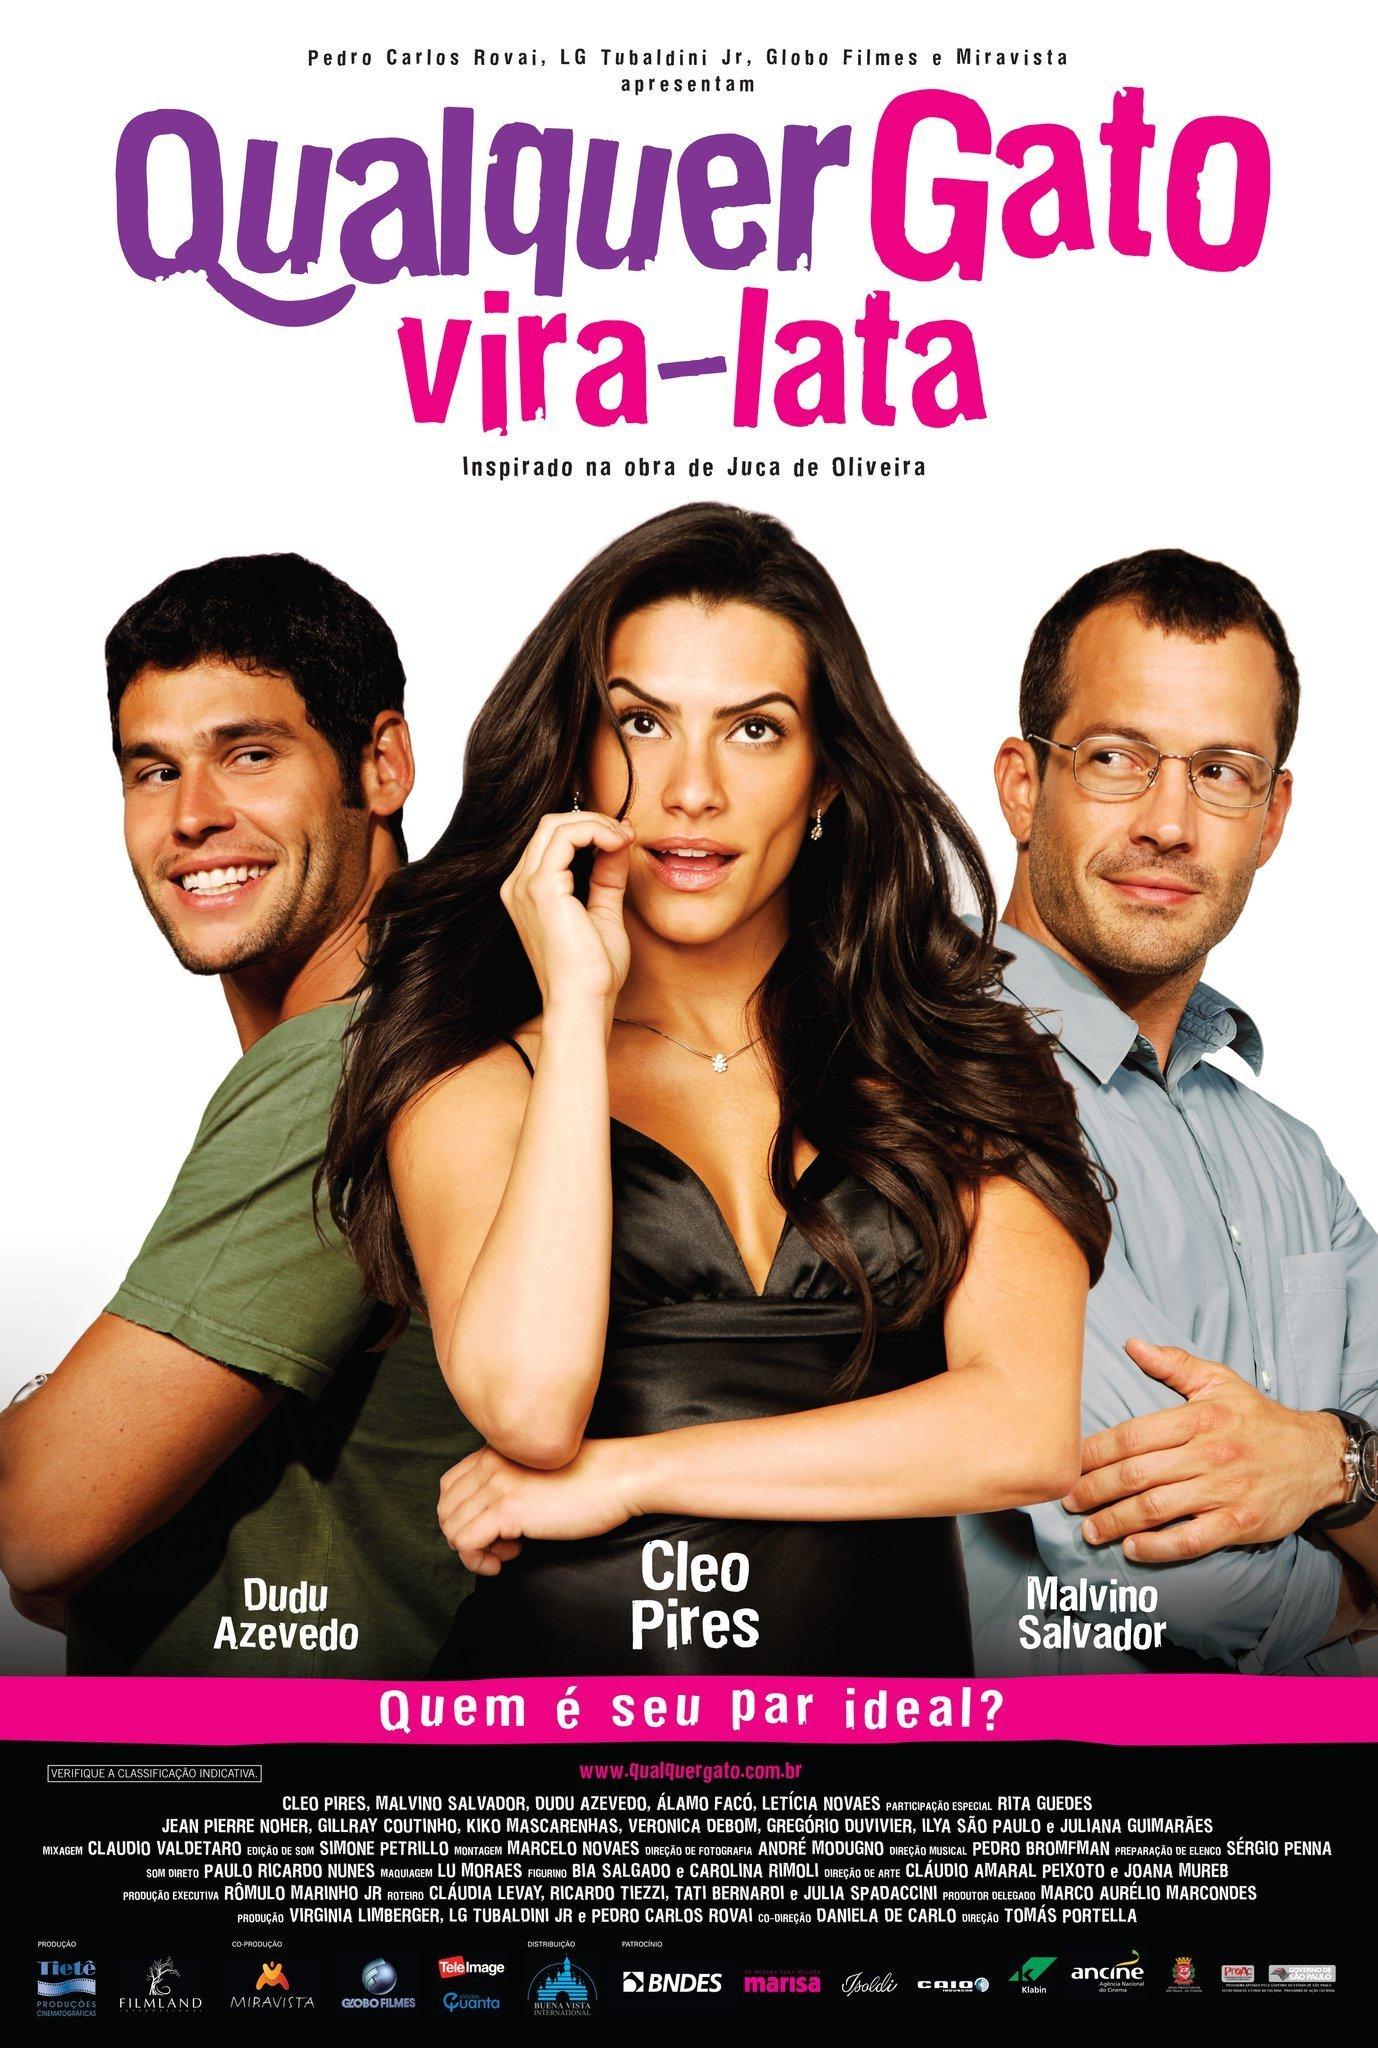 Qualquer Gato Vira-Lata [Nac] – IMDB 5.8